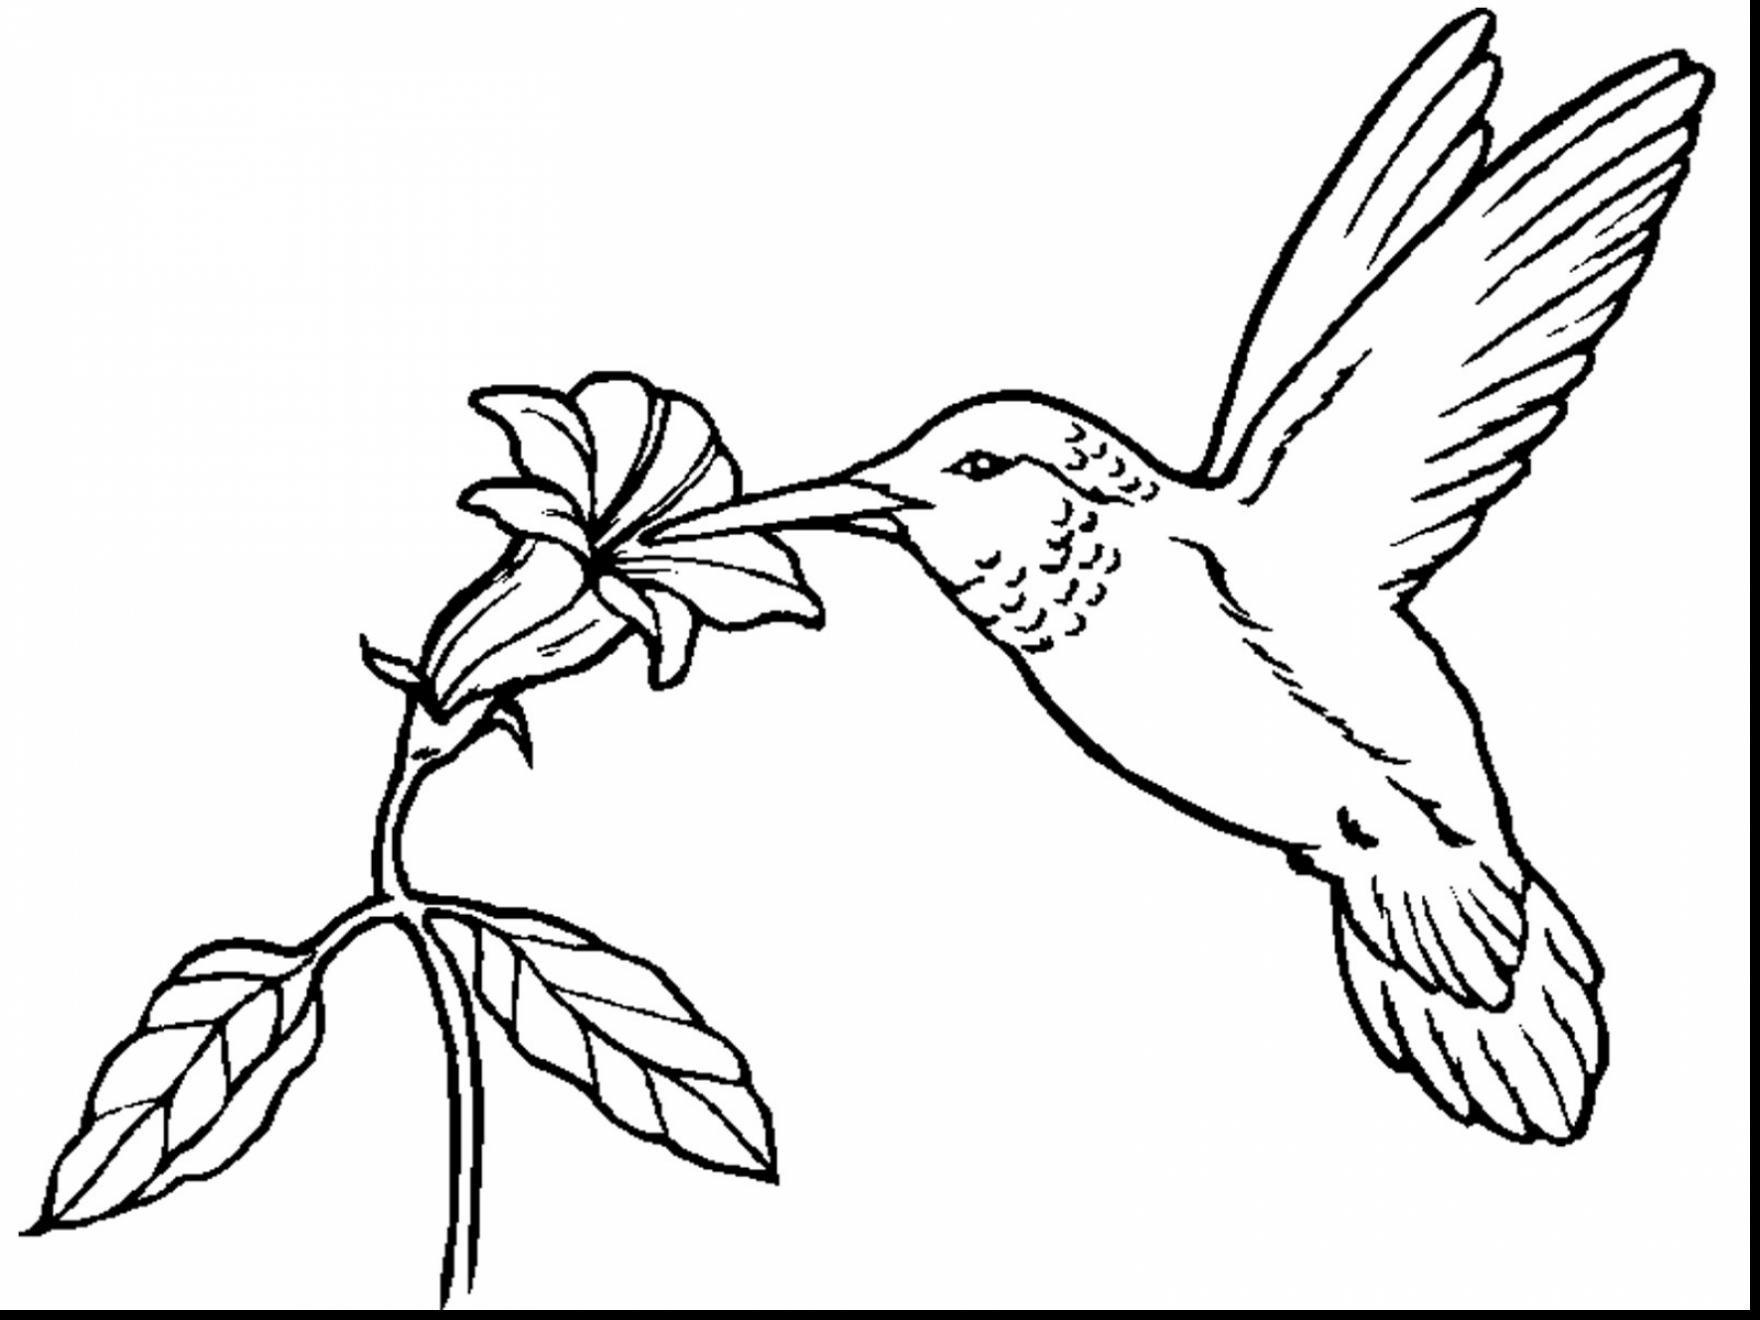 Free Printable Hummingbird Coloring Pages At Getdrawings